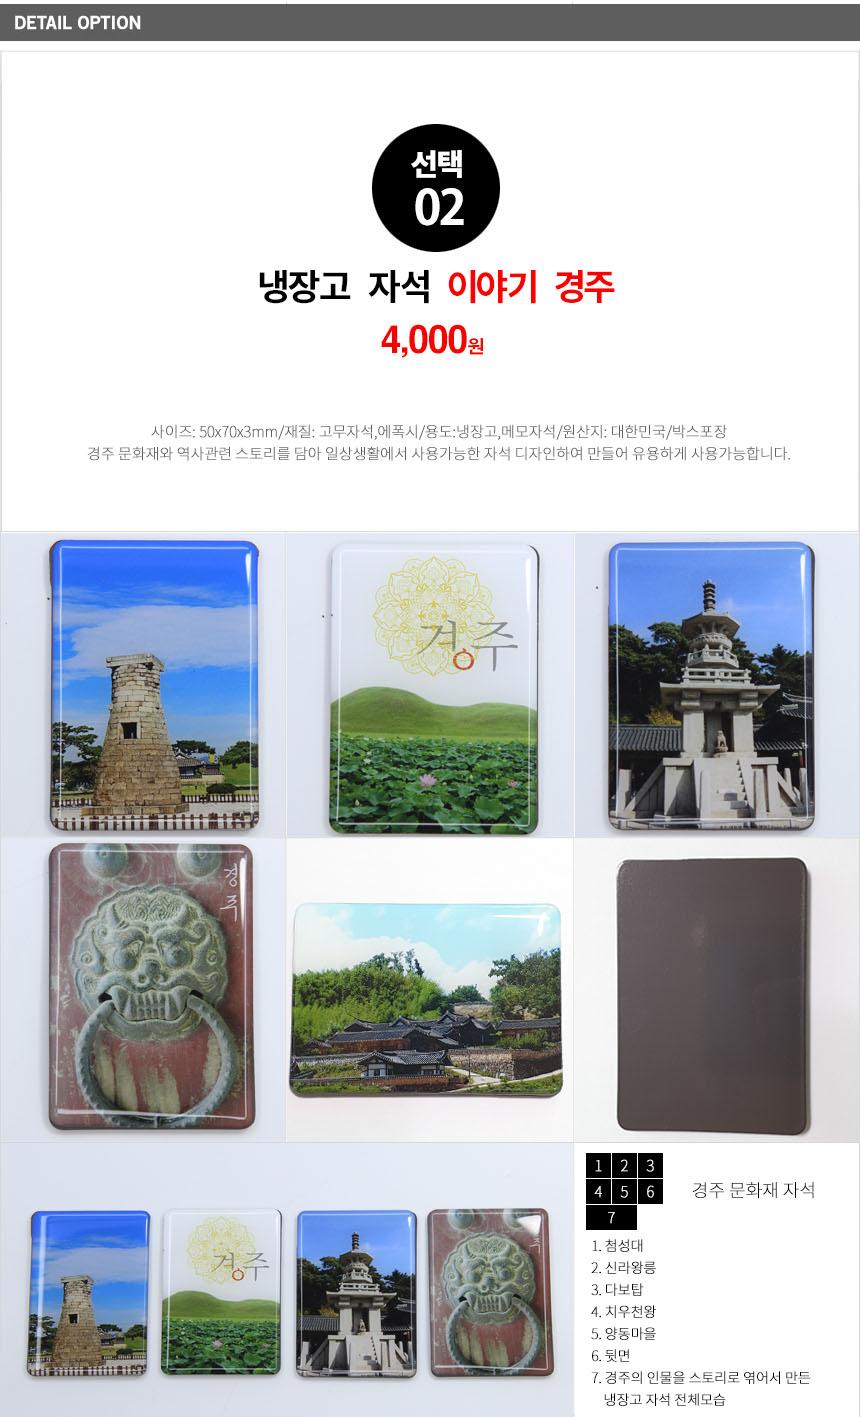 qsilla_magnet_gyeongjuA_02.jpg